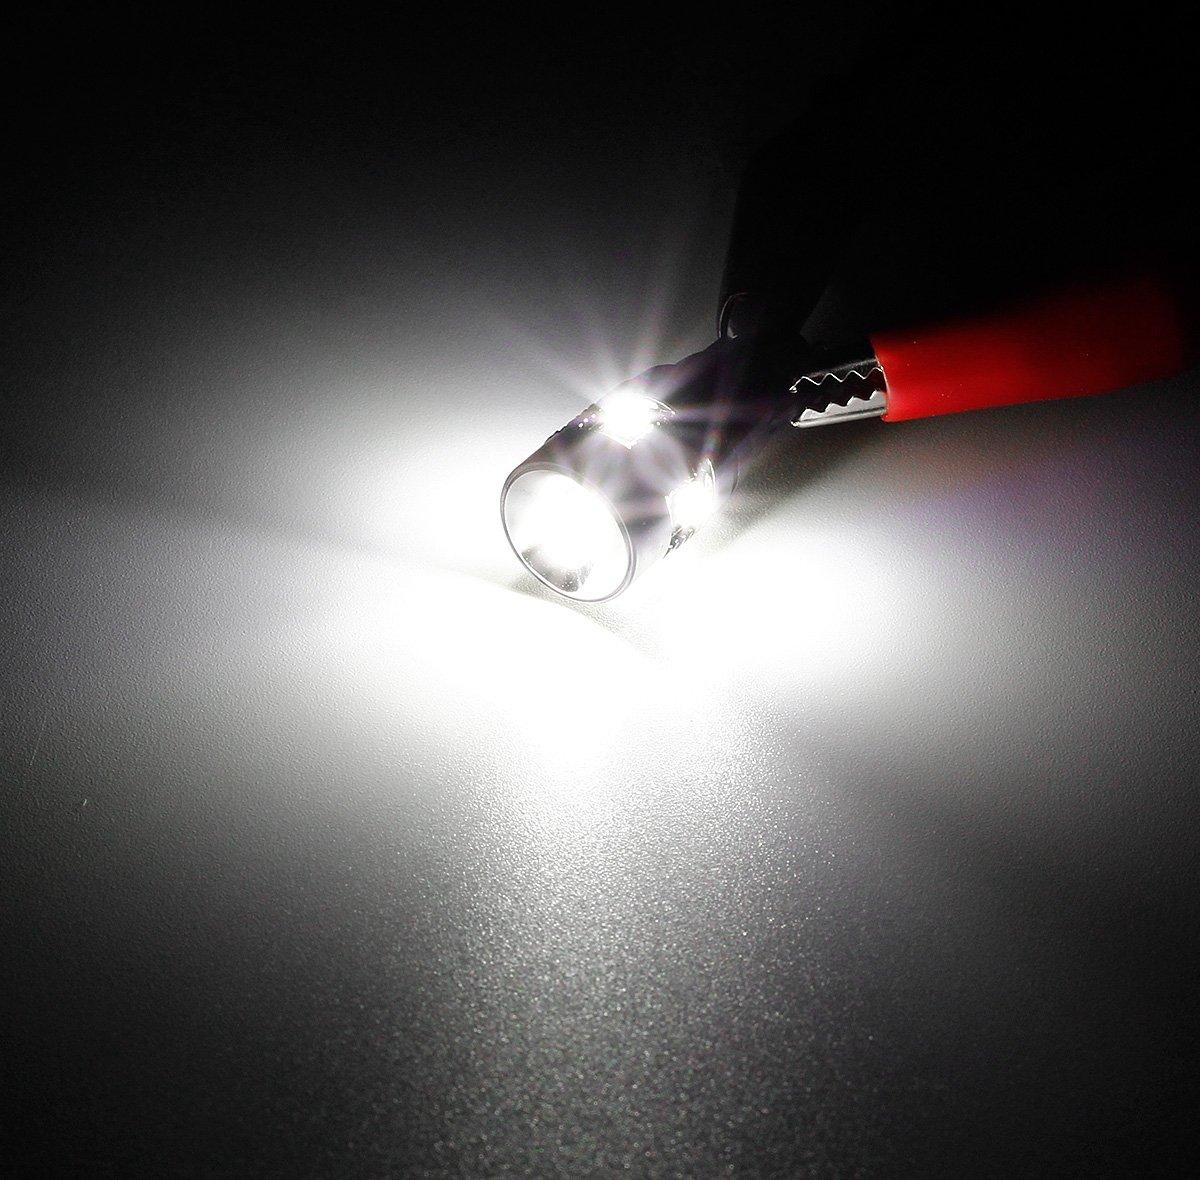 Partsam 2x Geniune Cree XB-D High Power T10 921 912 168 30W 800lm Xenon Super Bright White Car LED Bulbs Reverse Backup light Lamps